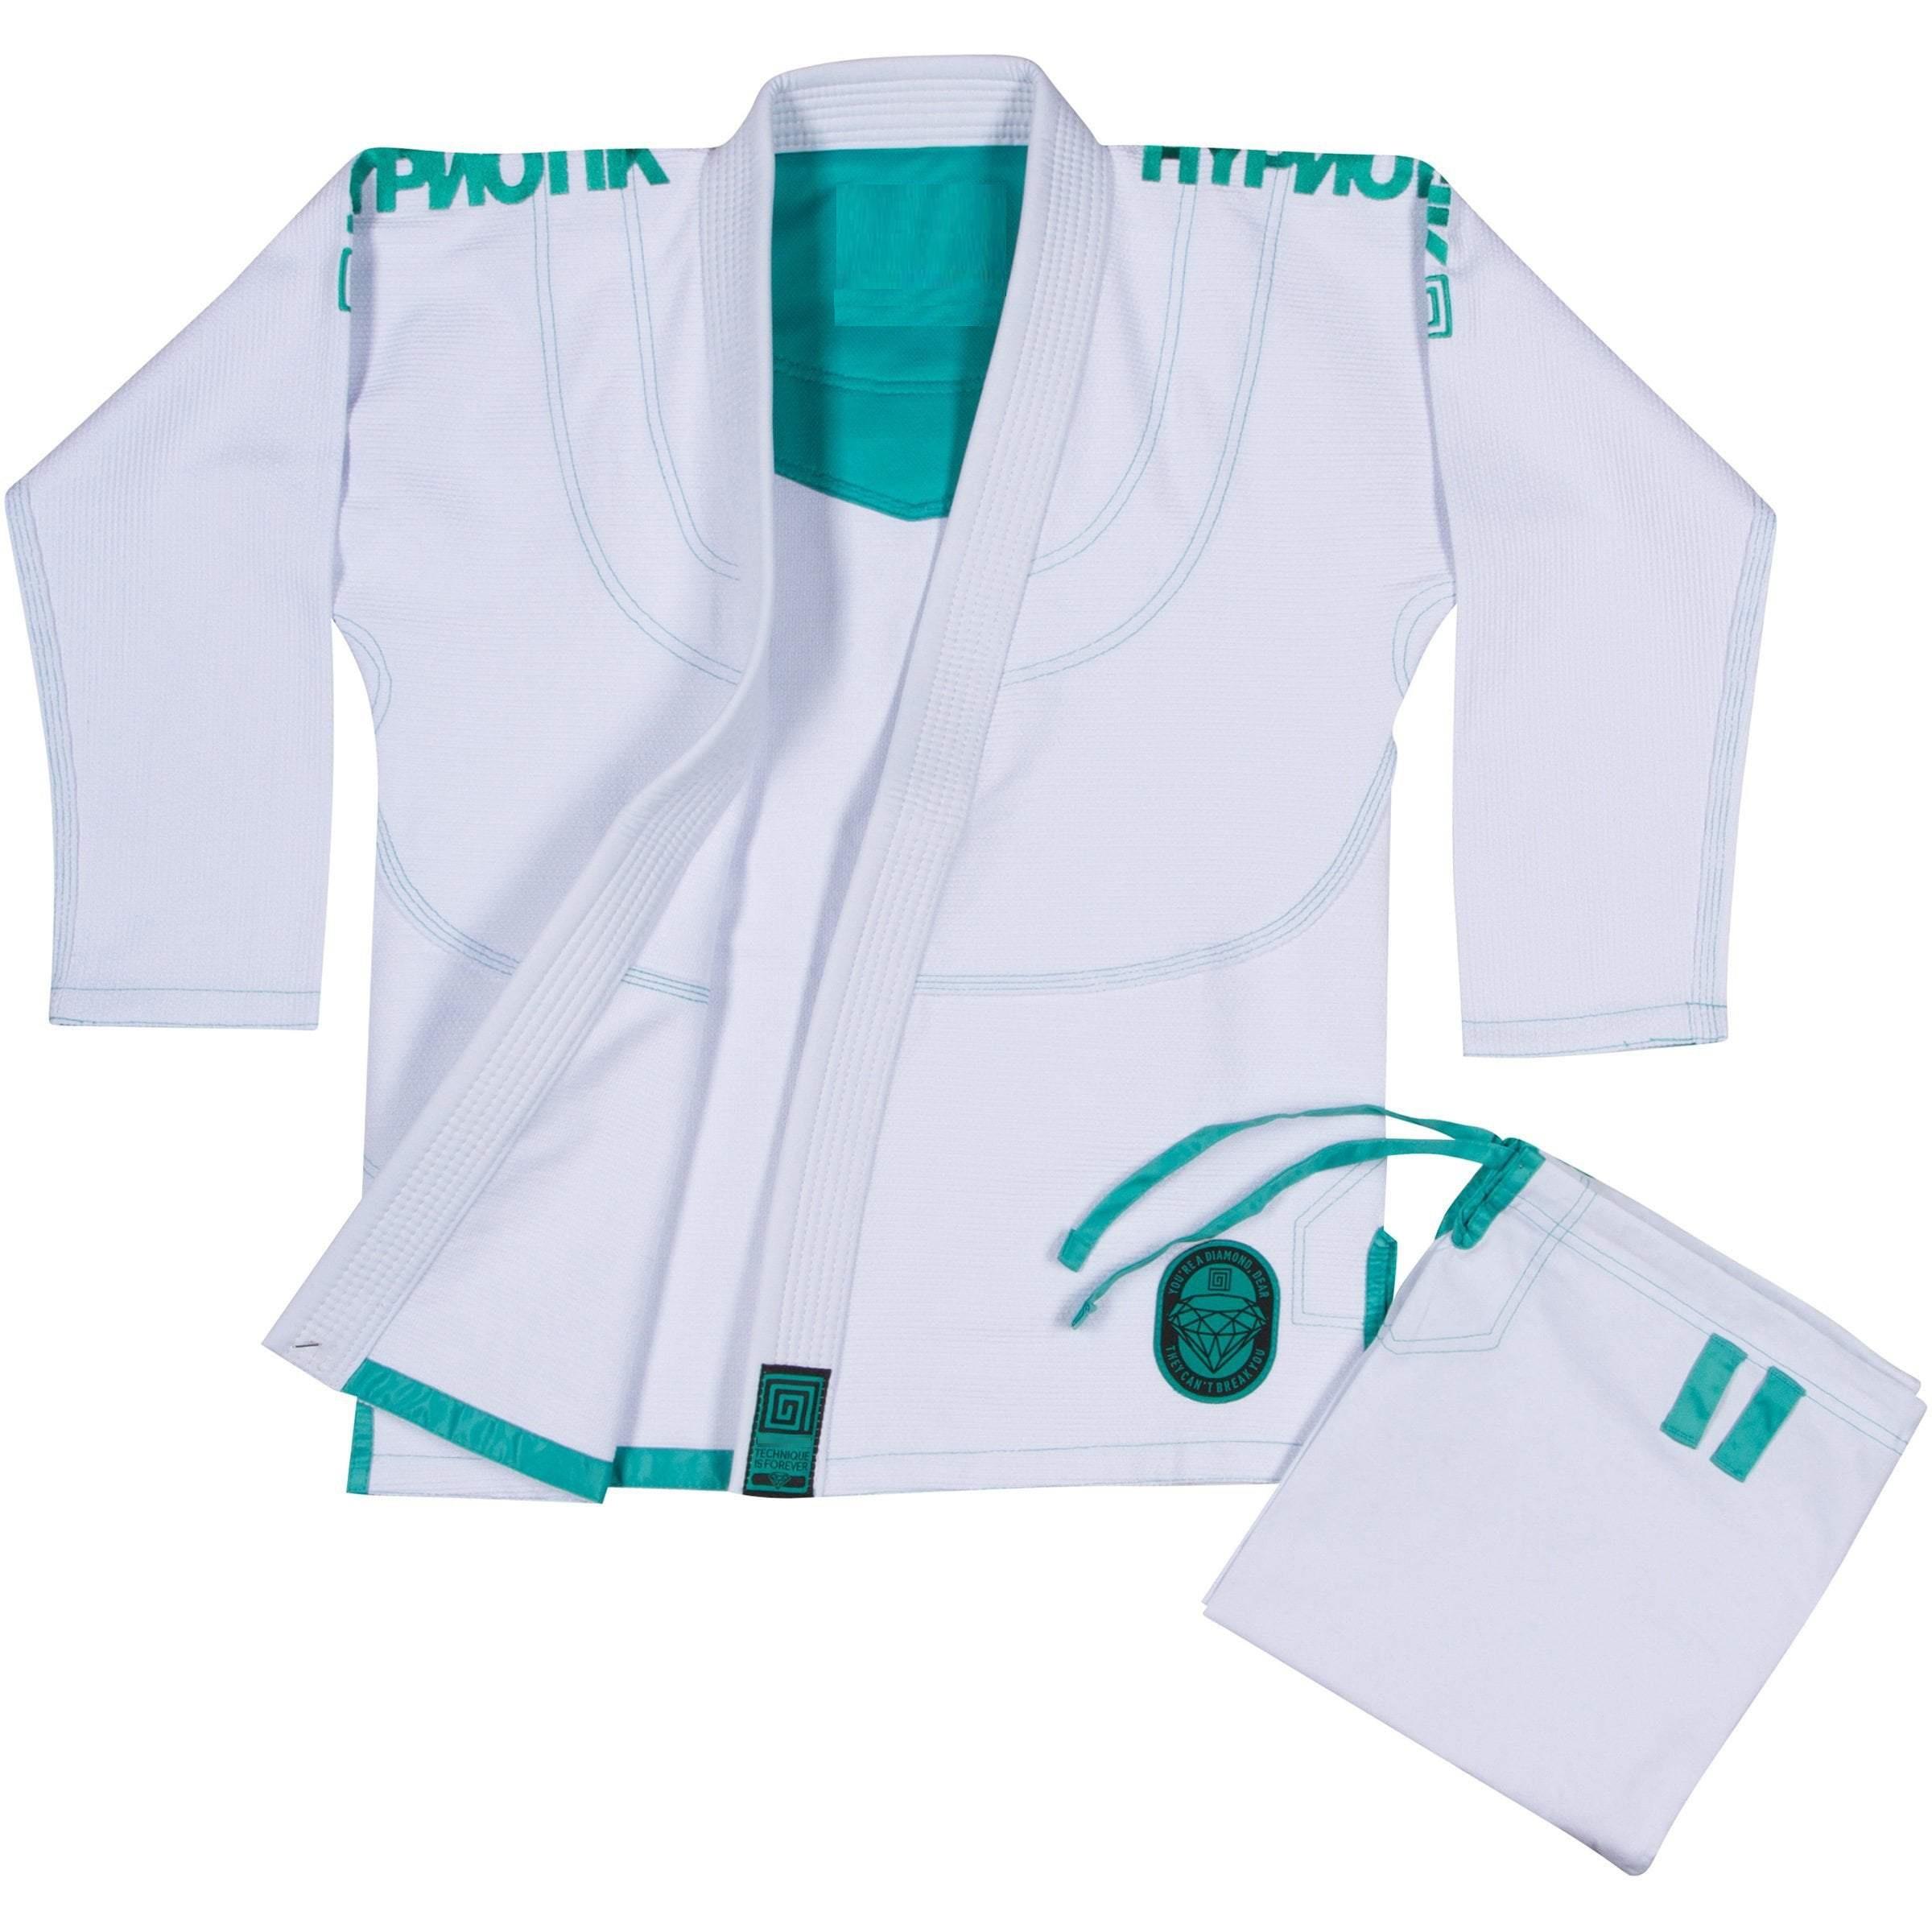 Custom Made BJJ Gi/'s New Arrival Shoyoroll Cut Professional Jiu Jitsu Uniform